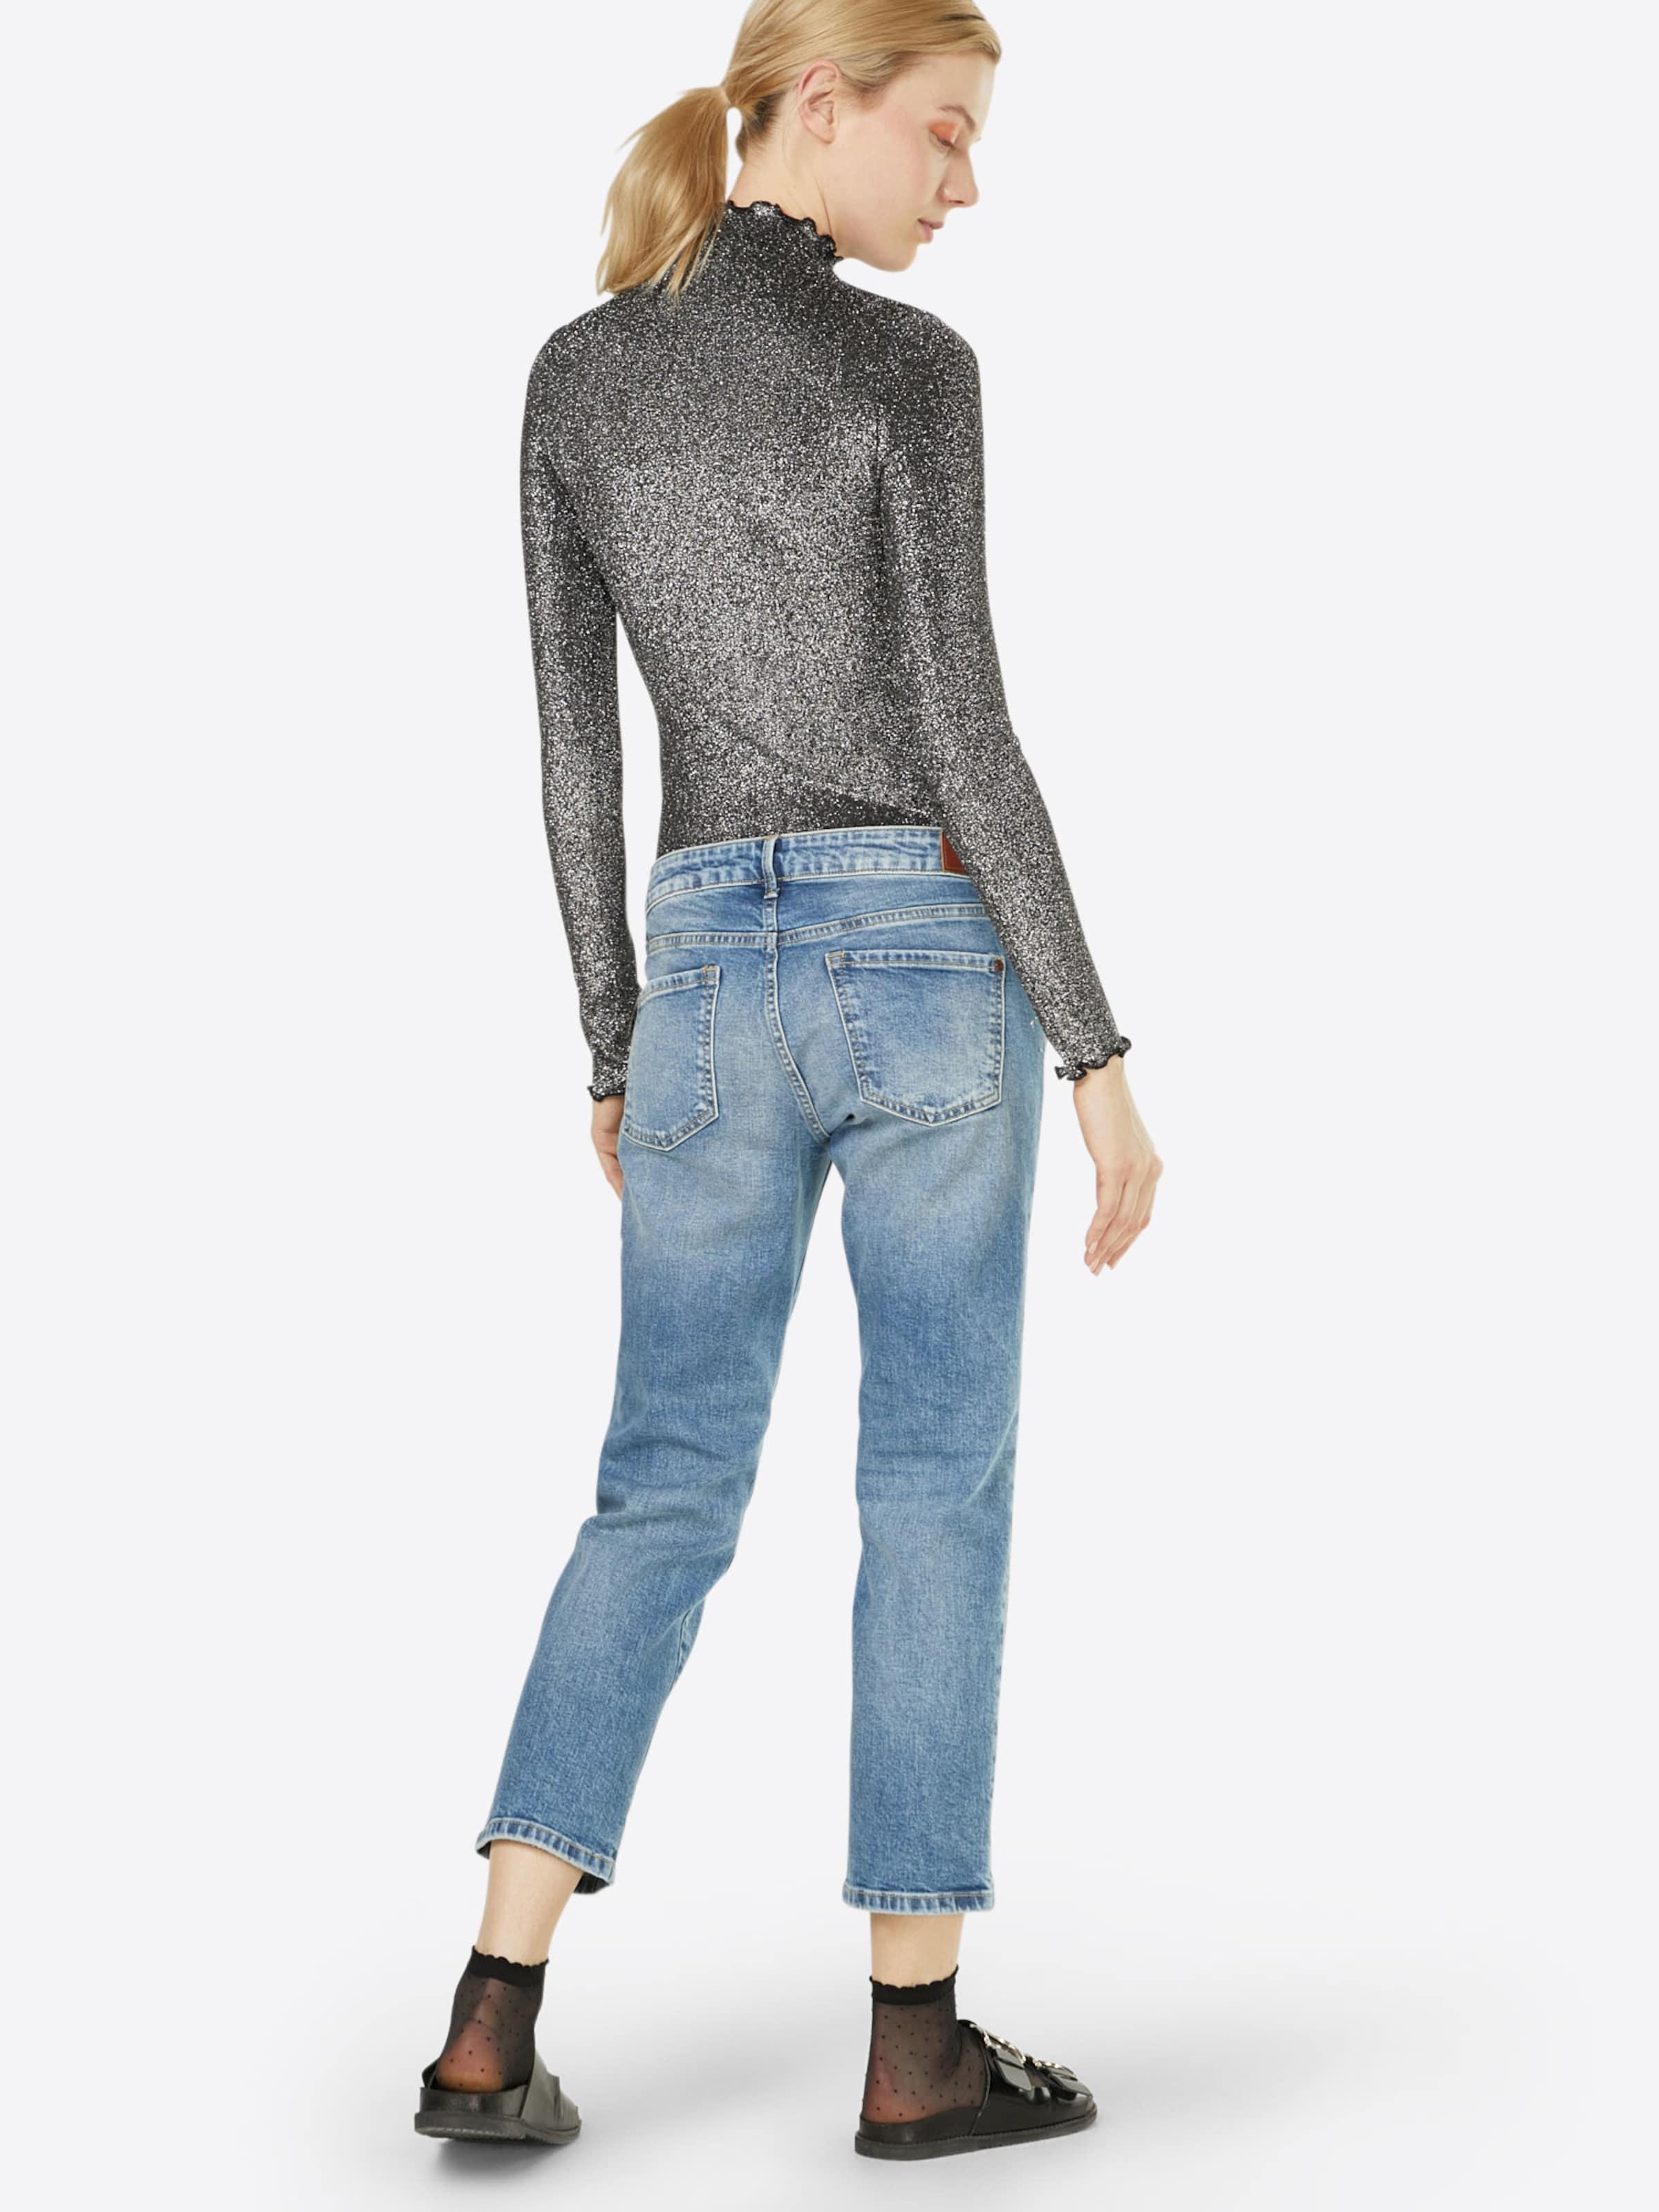 In 'jolie' Jeans Blau Pepe hQBtsrxCd